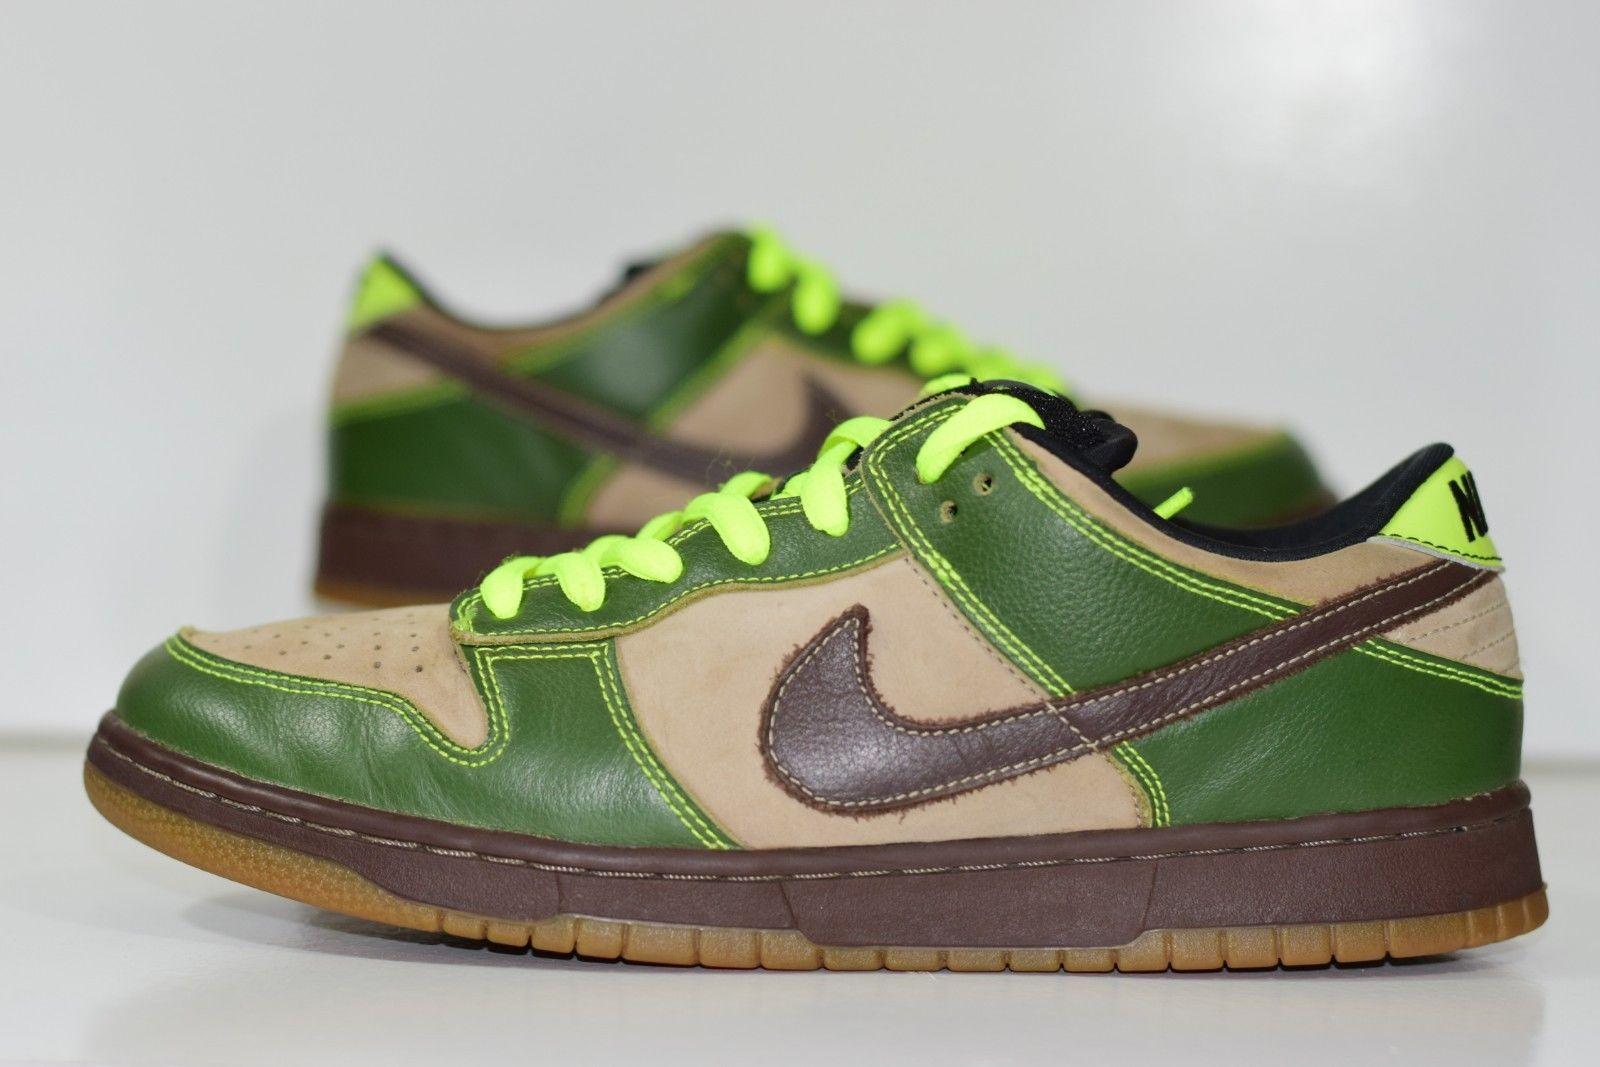 watch 9e638 6cc61 Size 10.5  2004 Nike Dunk Low Pro SB JEDI Star Wars Yoda 304292-